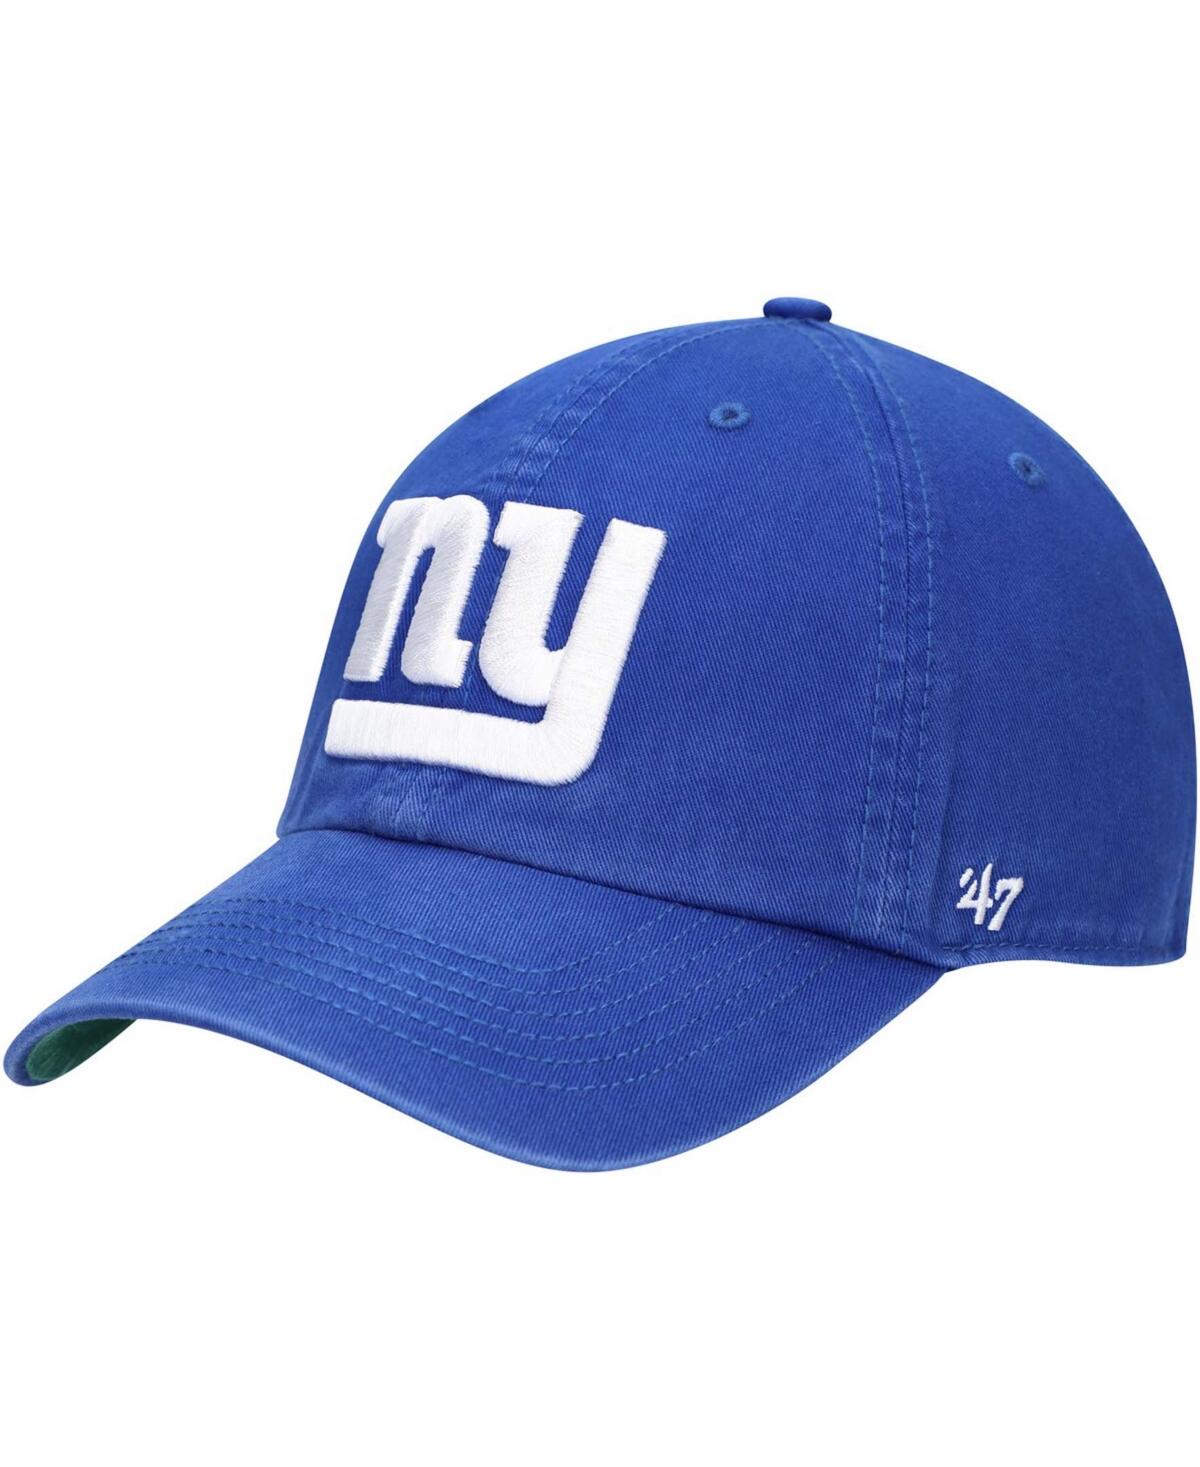 47 Brand New York Giants Franchise Logo Fitted Cap